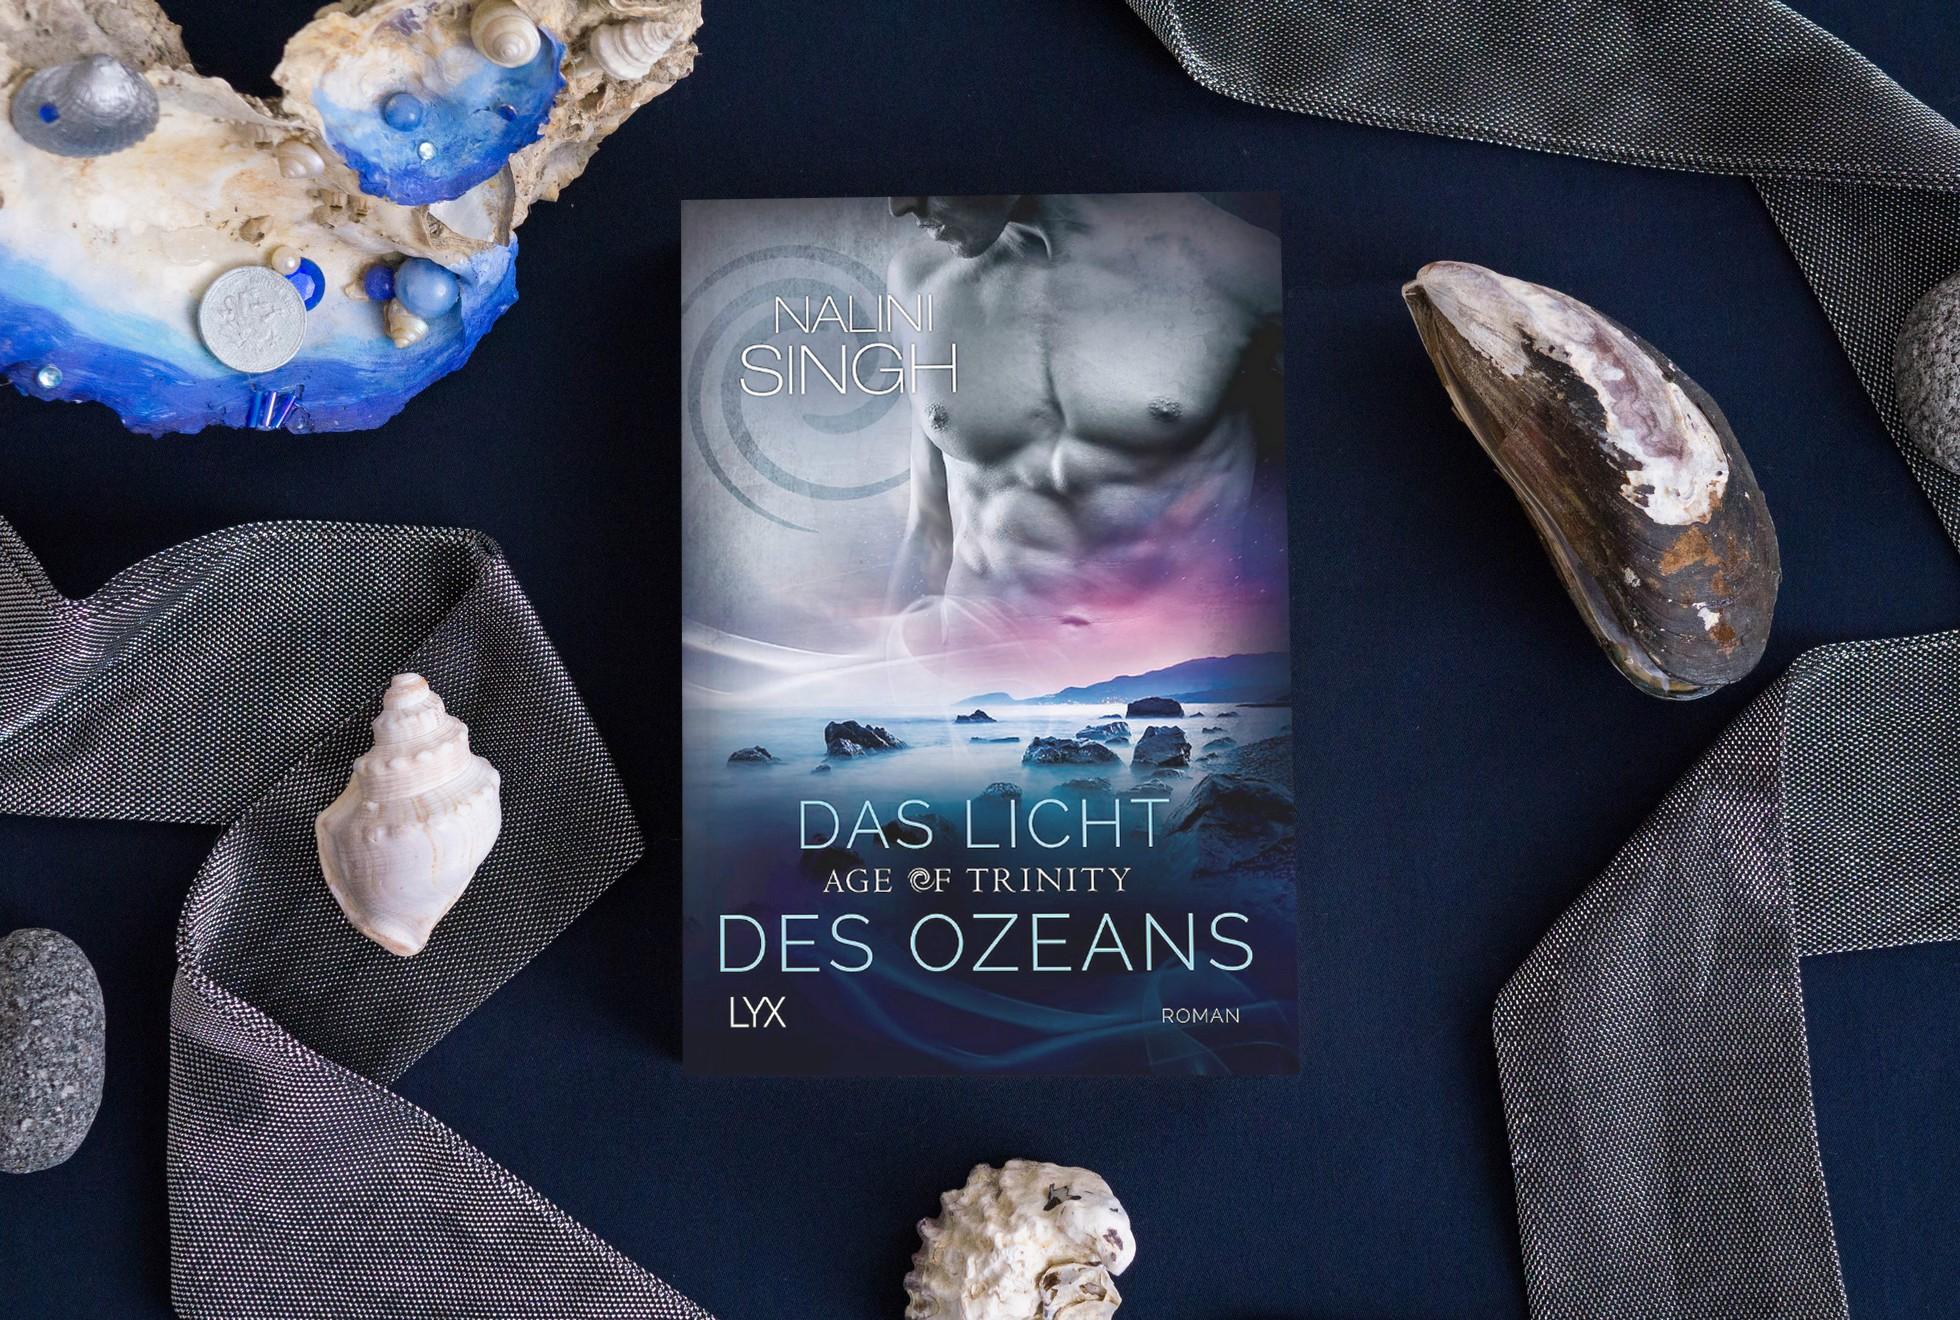 Age of Trinity: Das Licht des Ozeans – Nalini Singh graphic